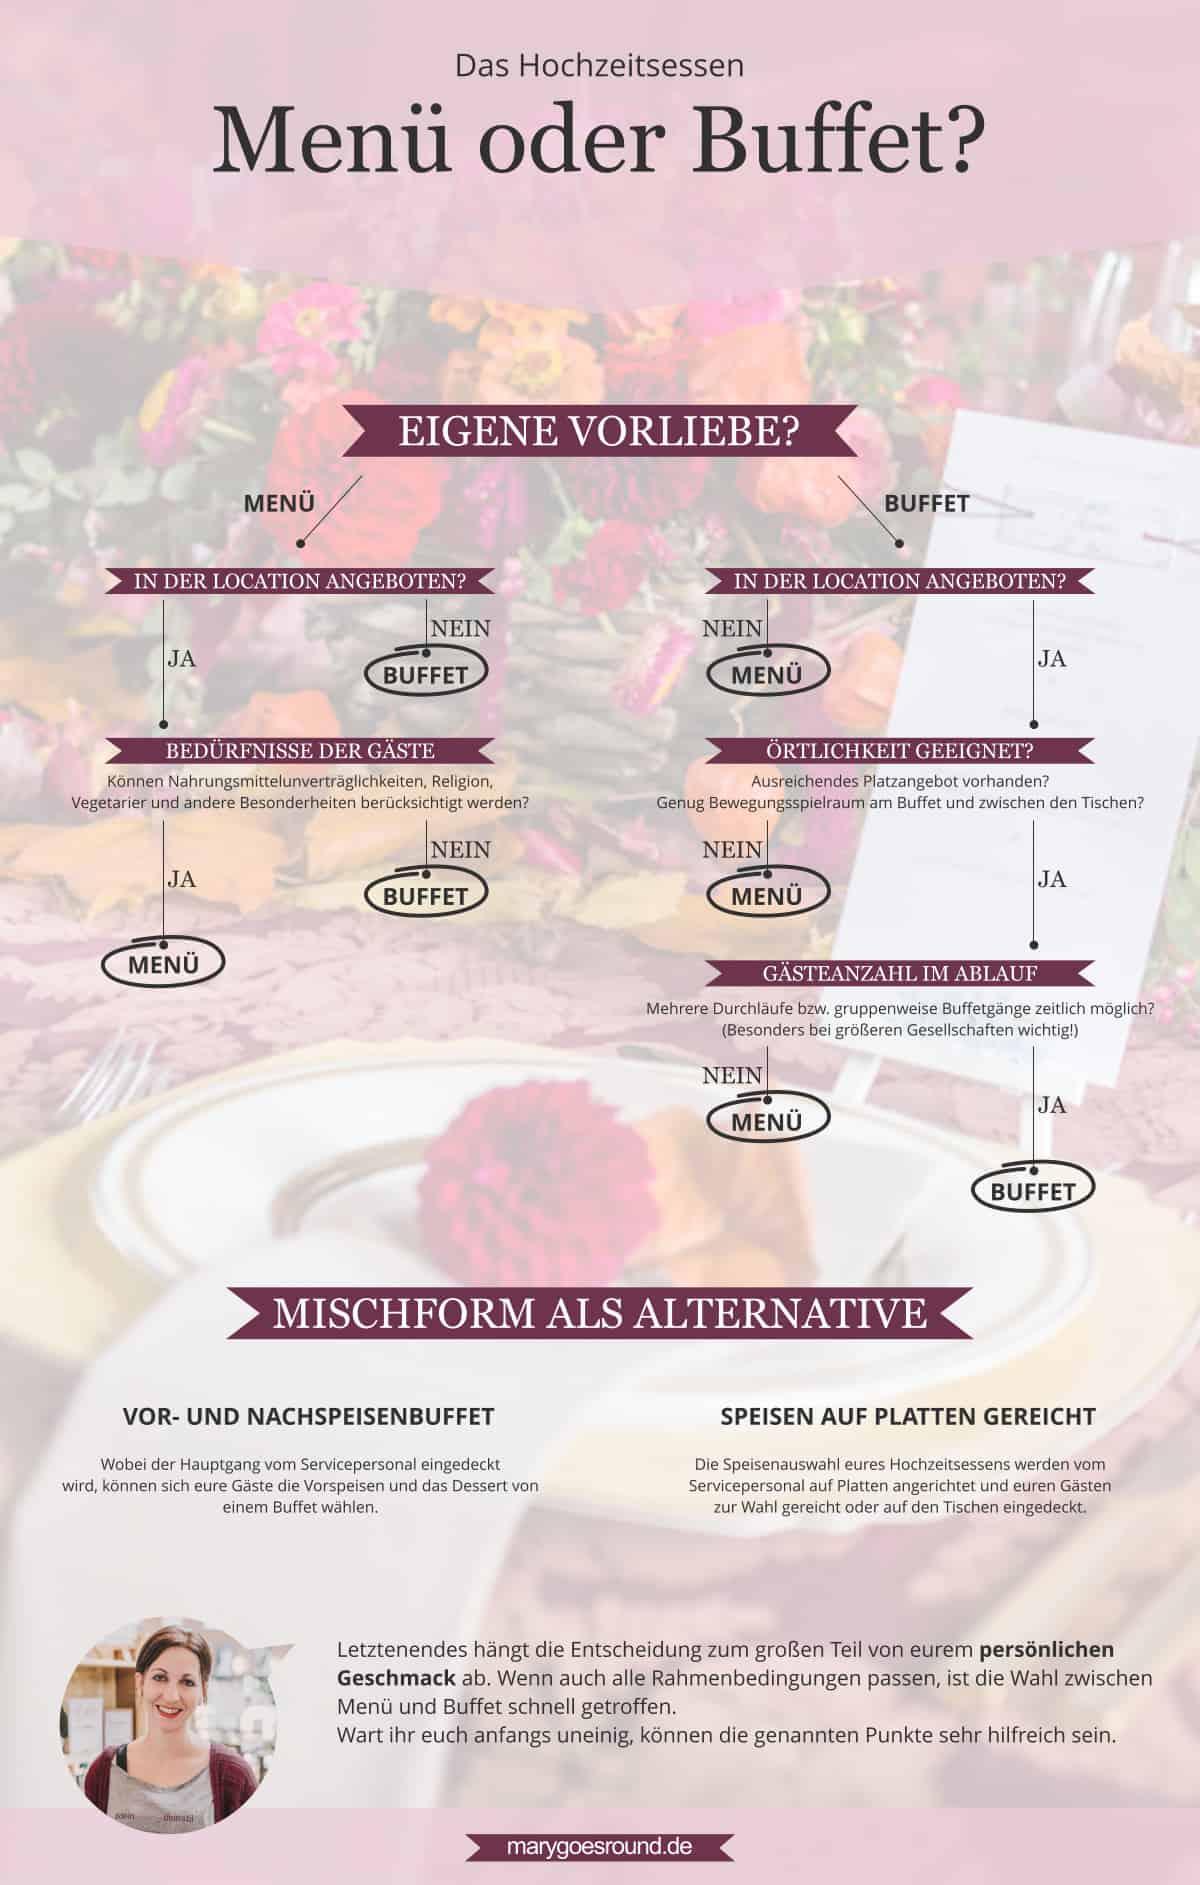 Hochzeitsessen: Menü oder Buffet, Infografik Hochzeitsplanung | marygoesround.de